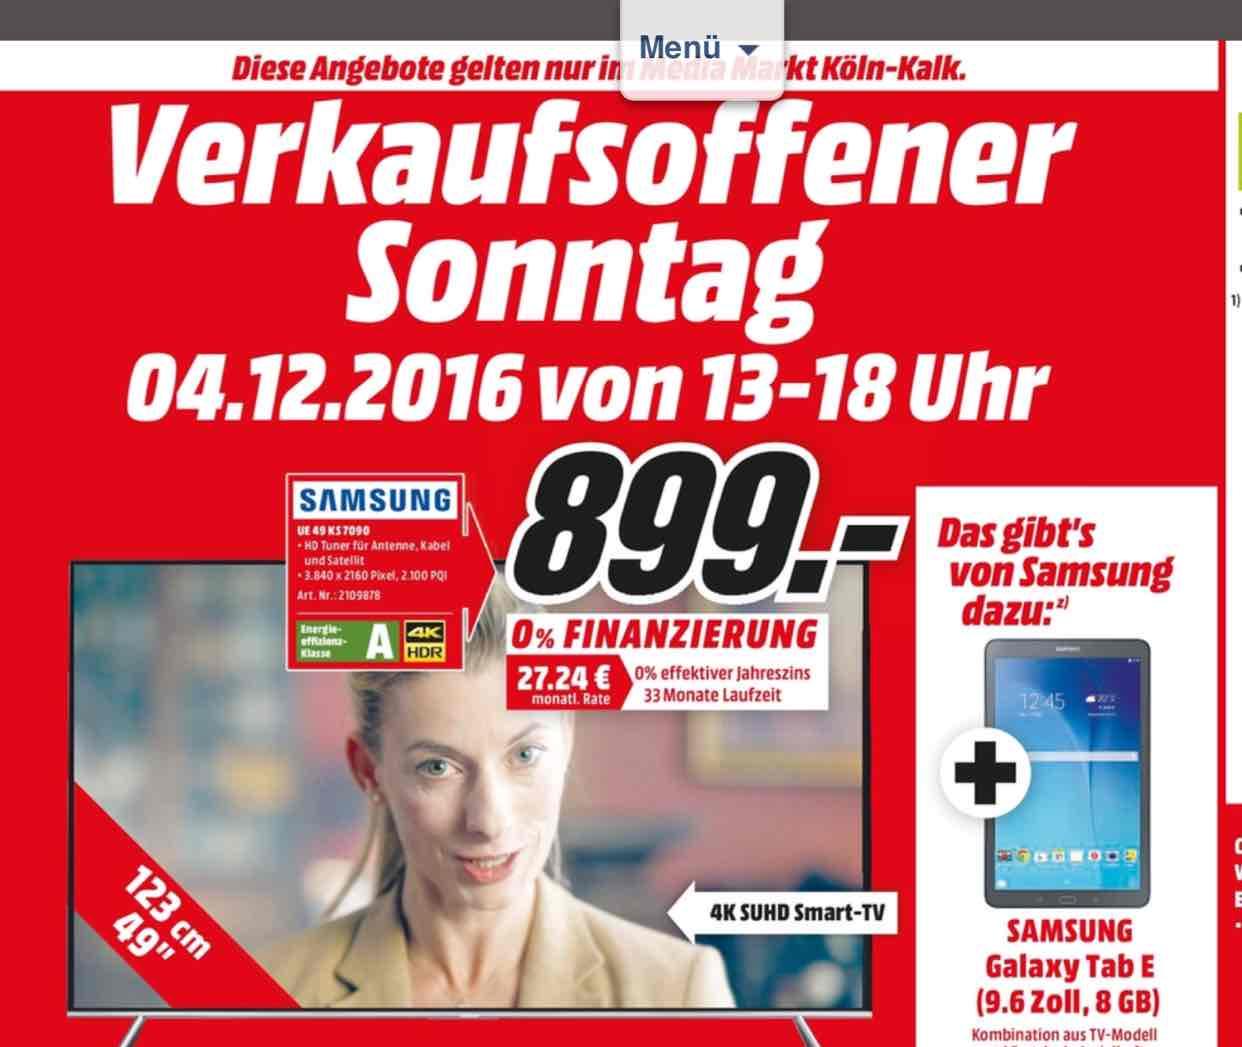 [lokal Media Markt Köln Kalk] Samsung UE 49 KS 7090 + Tab E, Samsung UE 65 KS 9090 + S7 EDGE